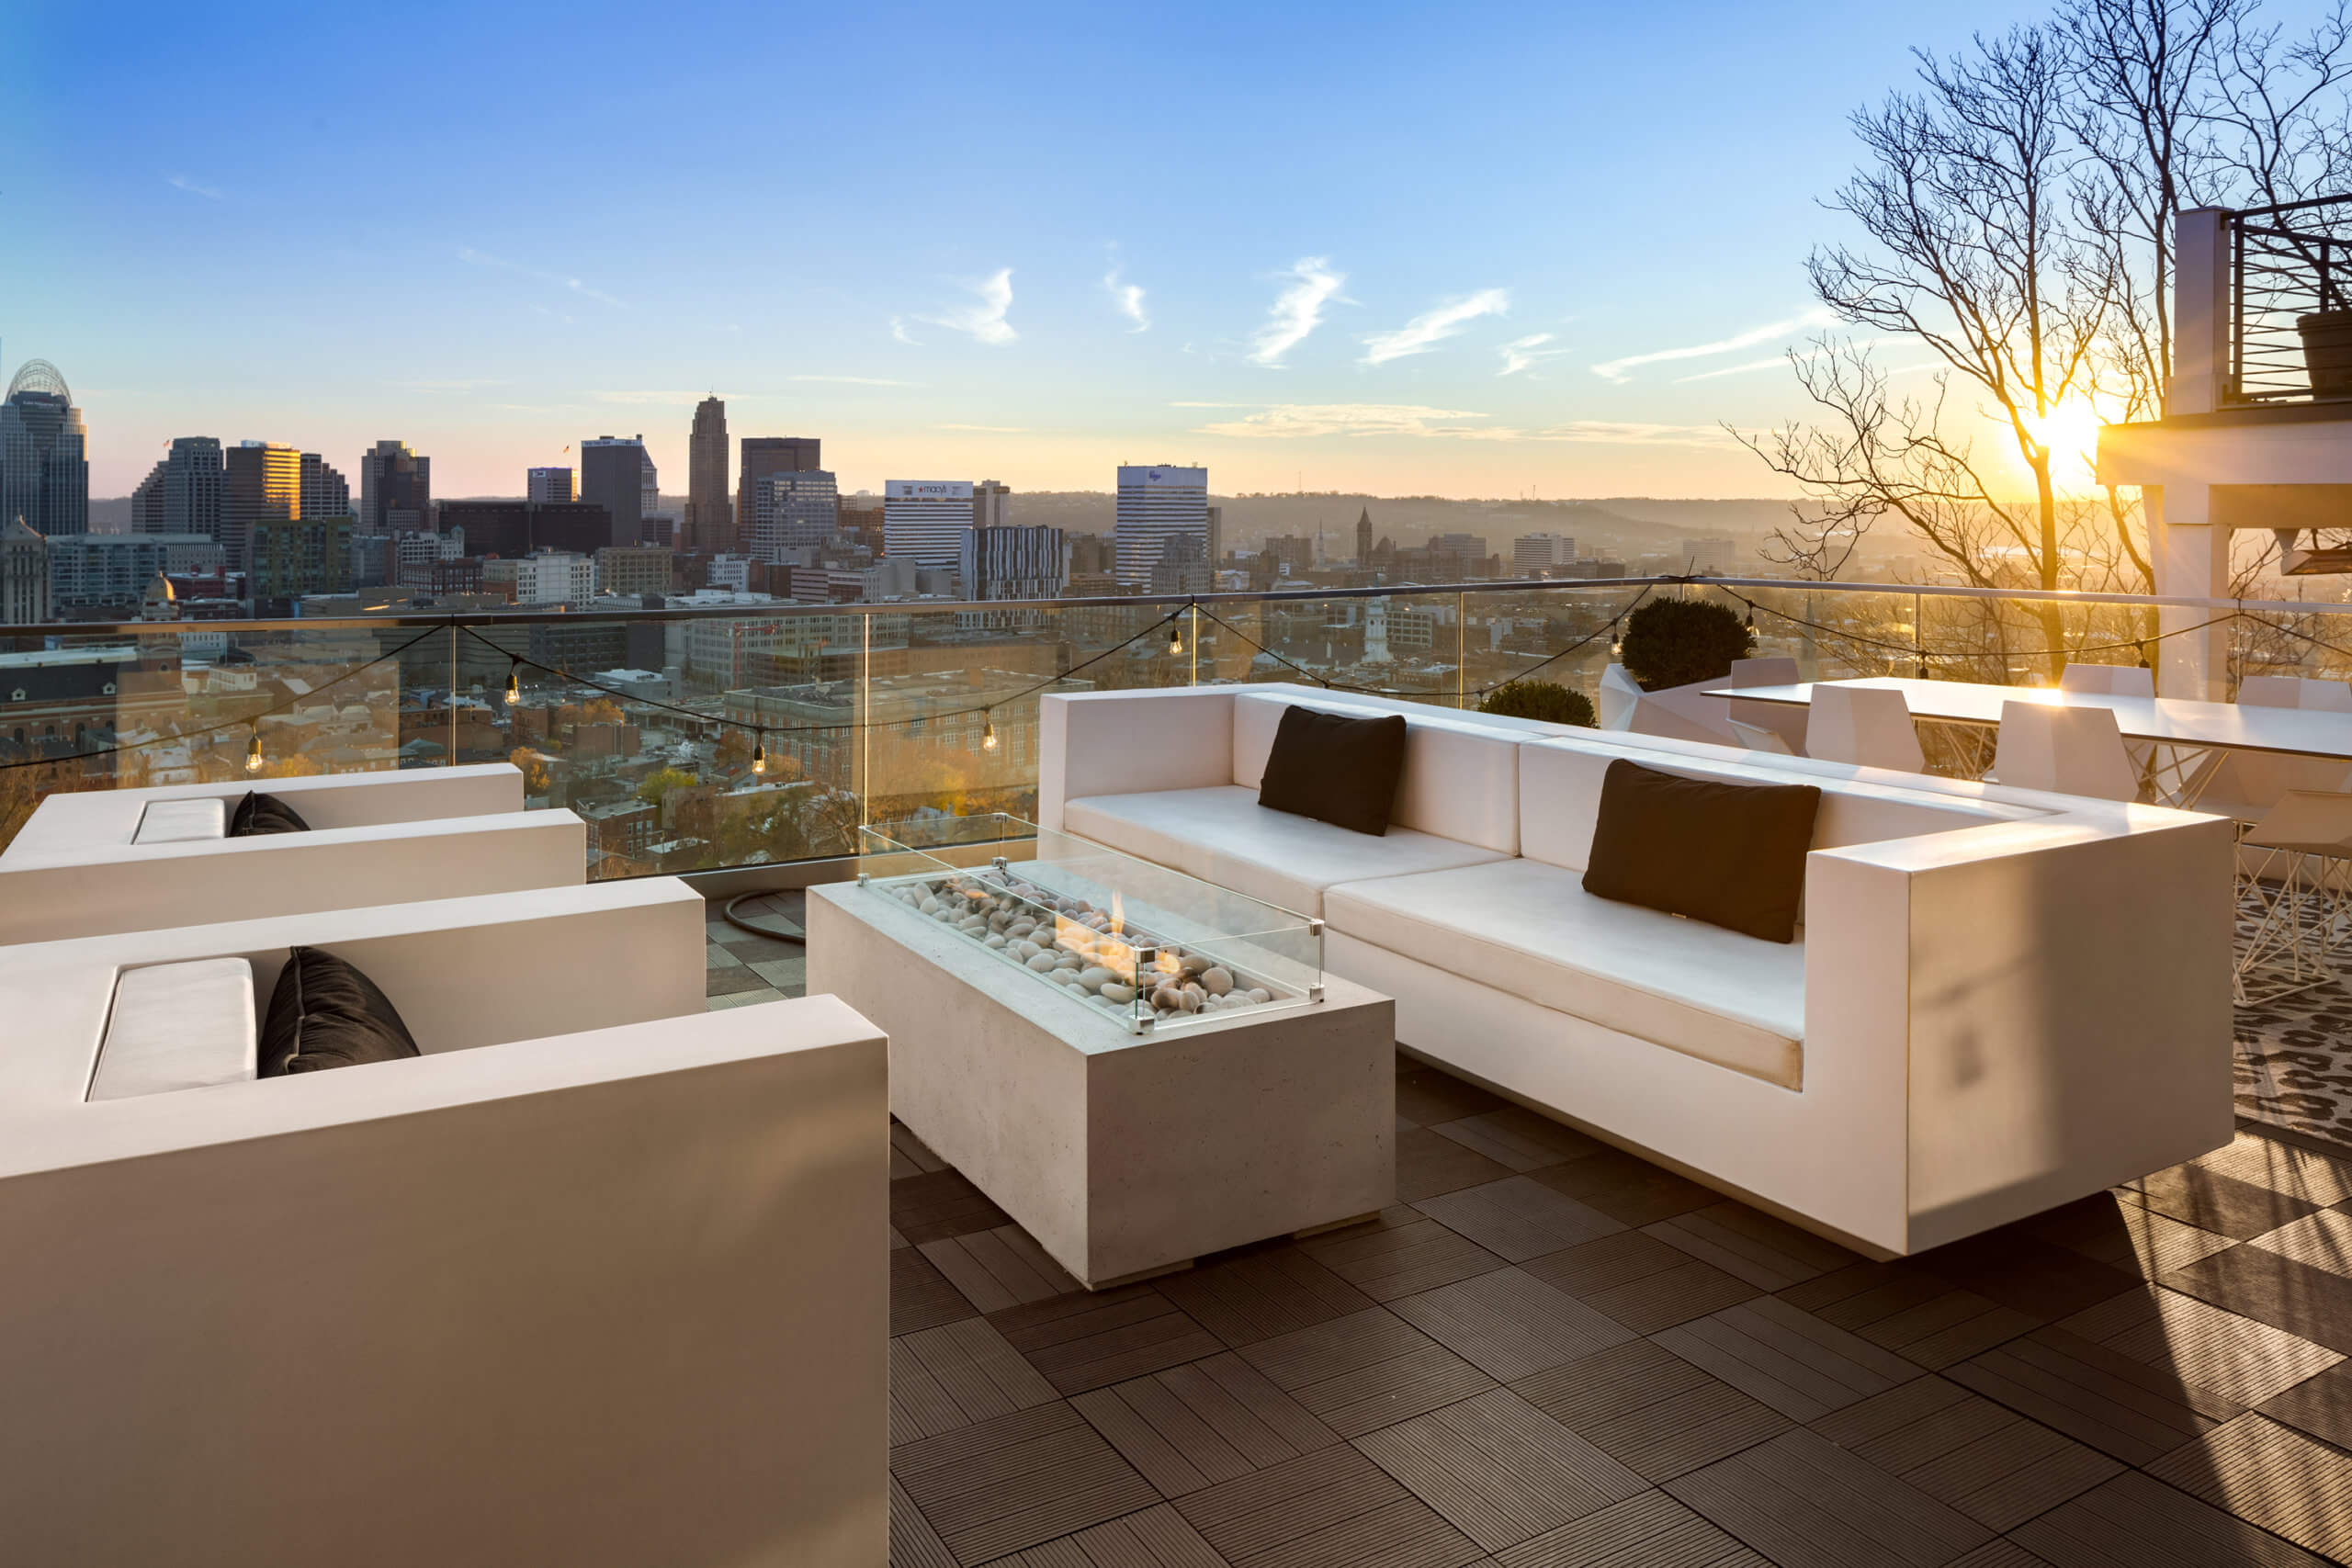 Sunset view of the Cincinnati Skyline from a Modern Rooftop Designed by Premiere Cincinnati Interior Designer, RM Interiors.